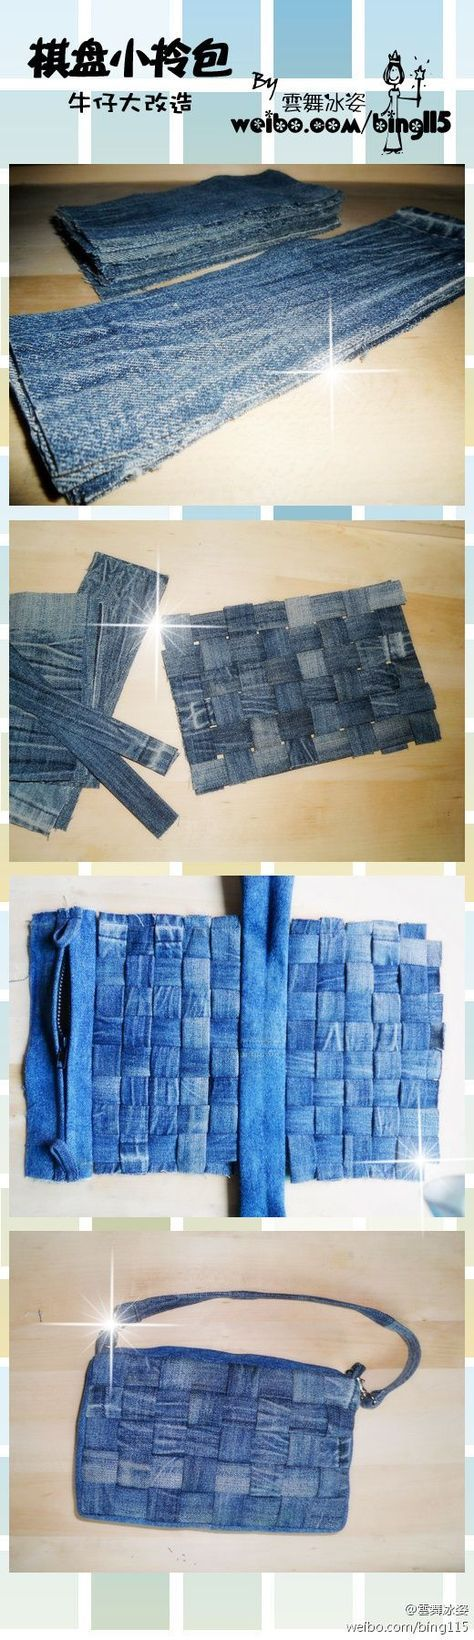 DIY Small Checkerboard Bag DIY Projects | UsefulDIY.com